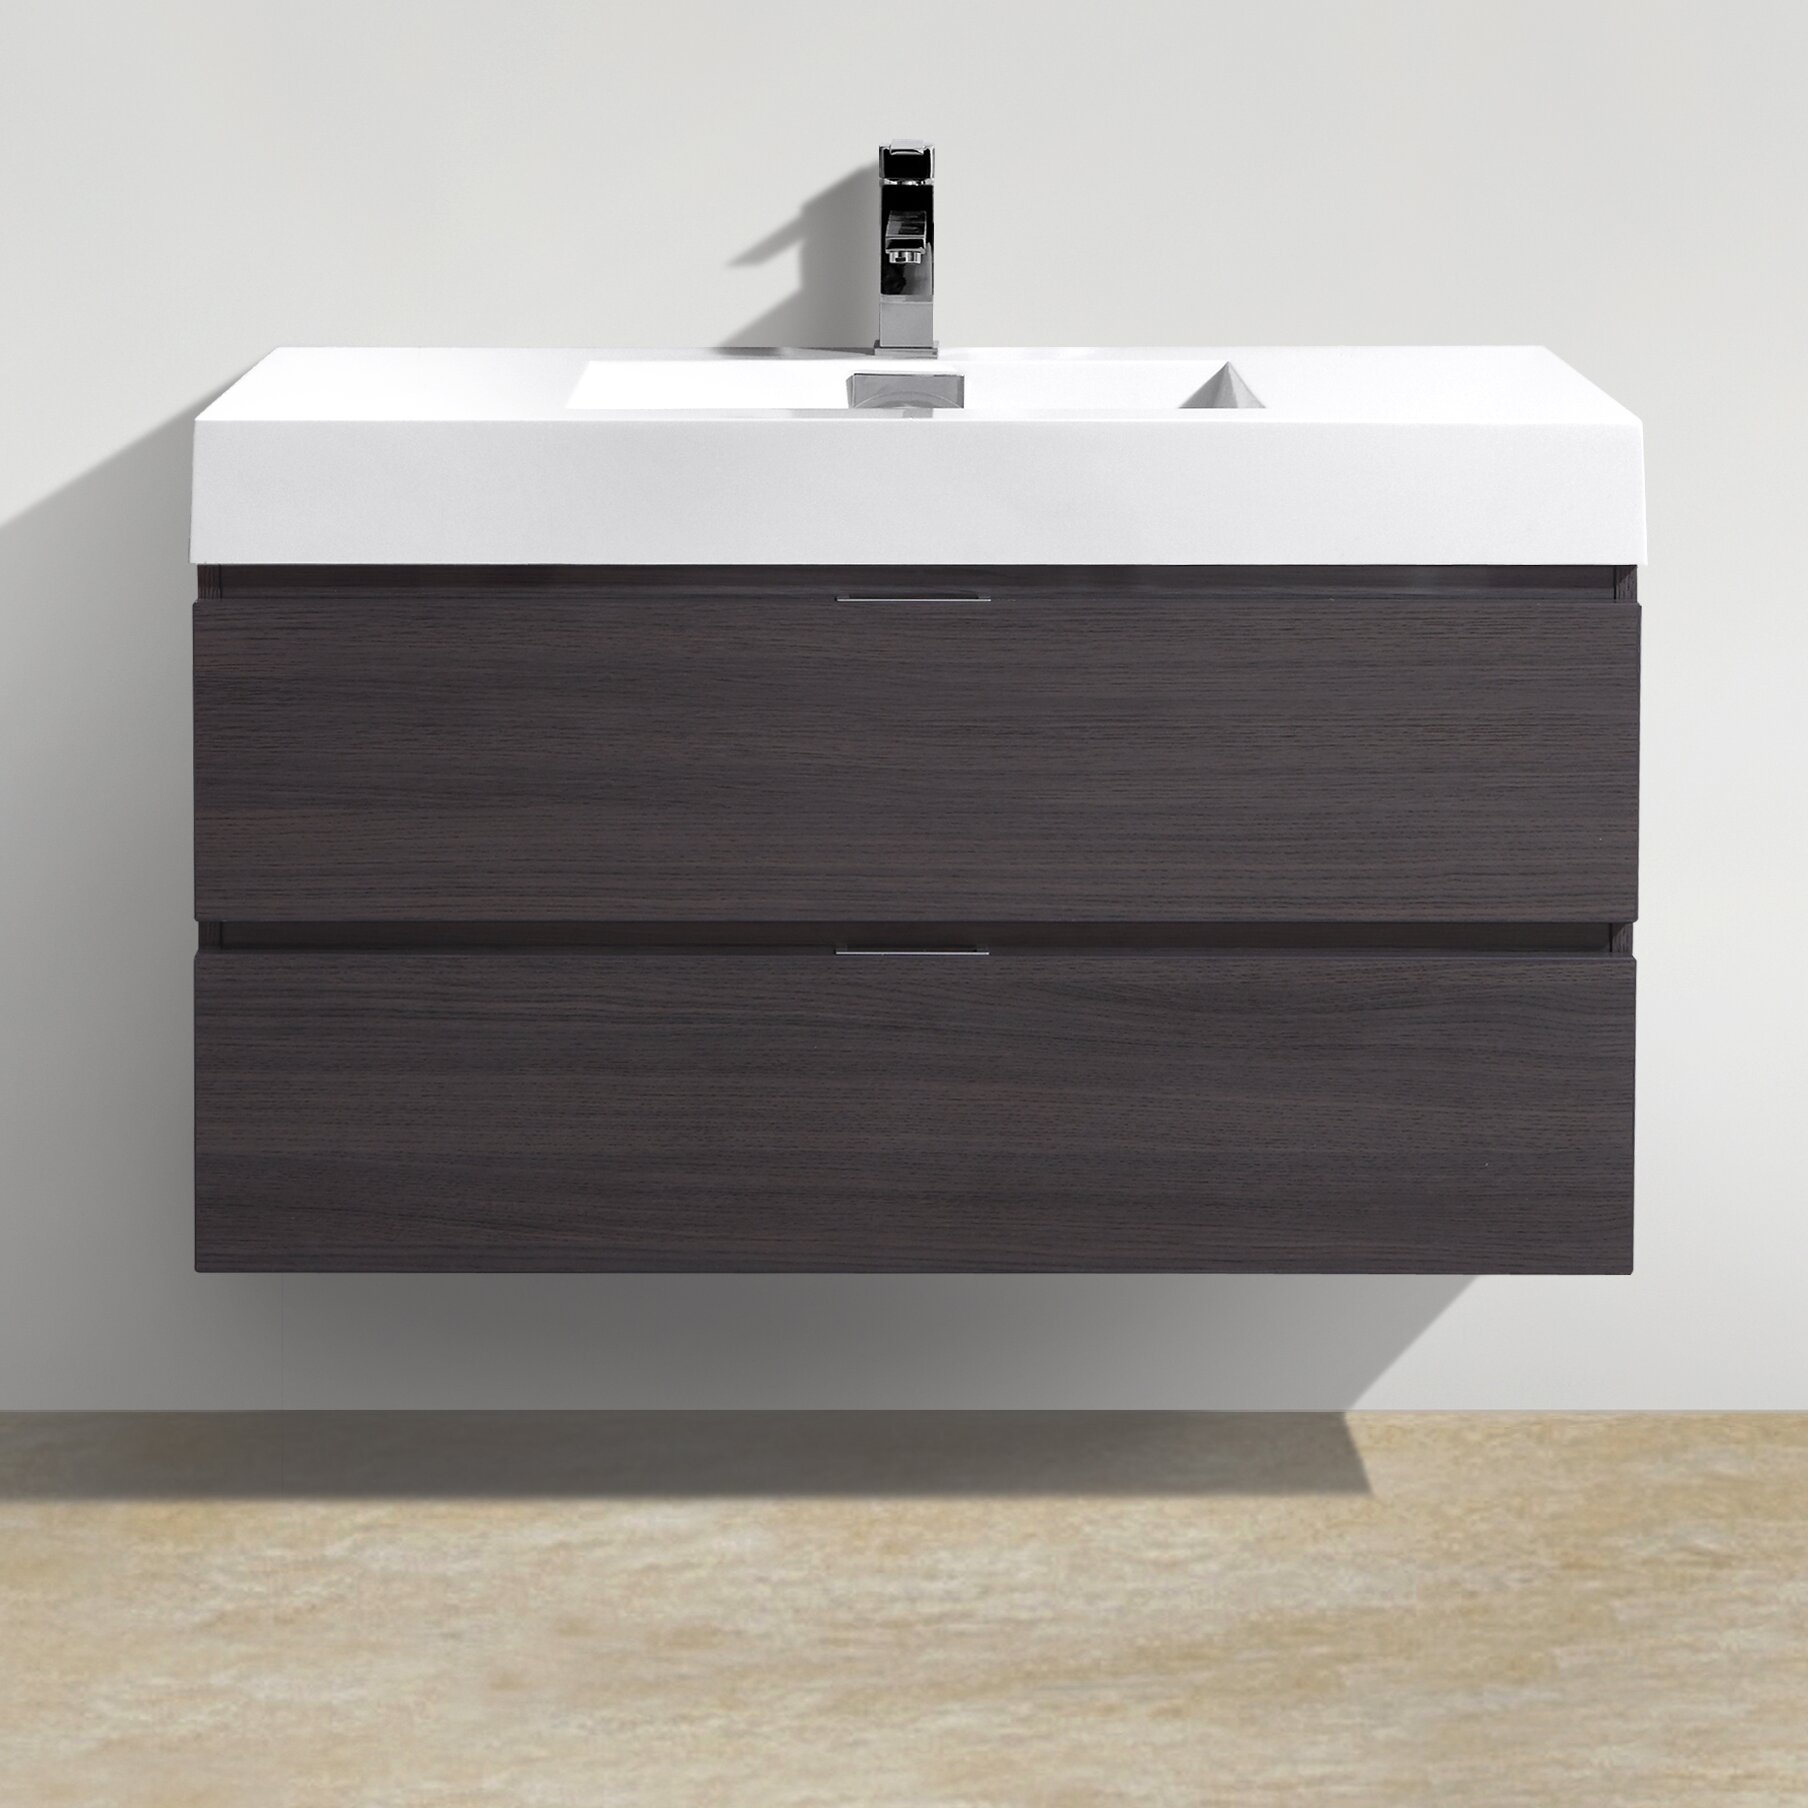 Designer Bathroom Accessories Sets Wade Logan Tenafly 40 Single Wall Mount Modern Bathroom Vanity